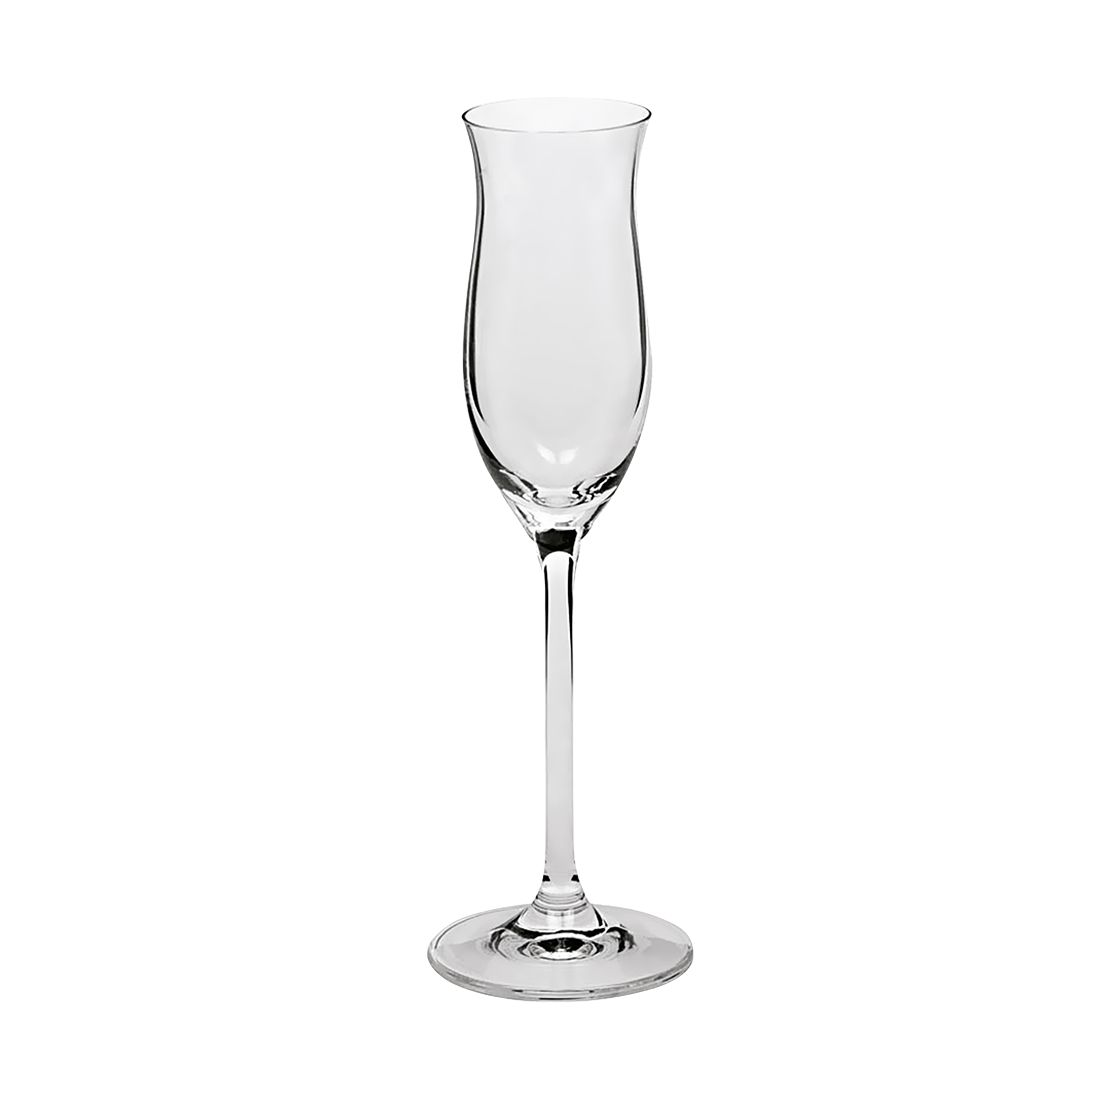 6er-Set Grappaglas Cheers – Glas Transparent, Leonardo online kaufen